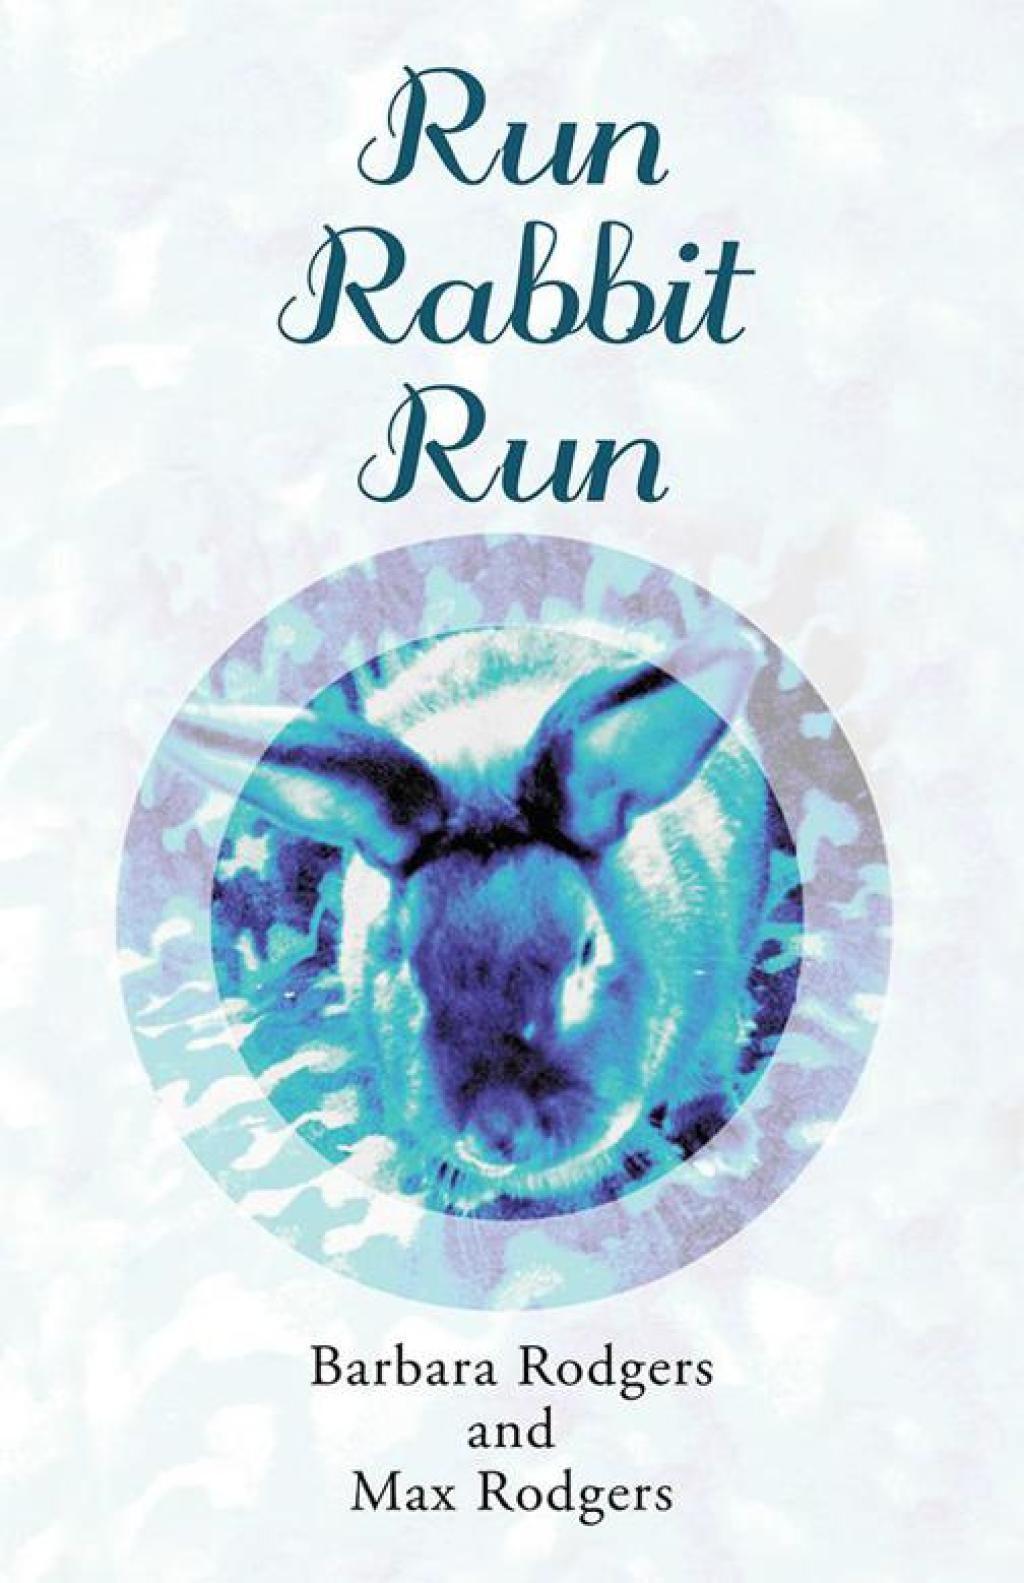 Run rabbit run ebook rabbit running